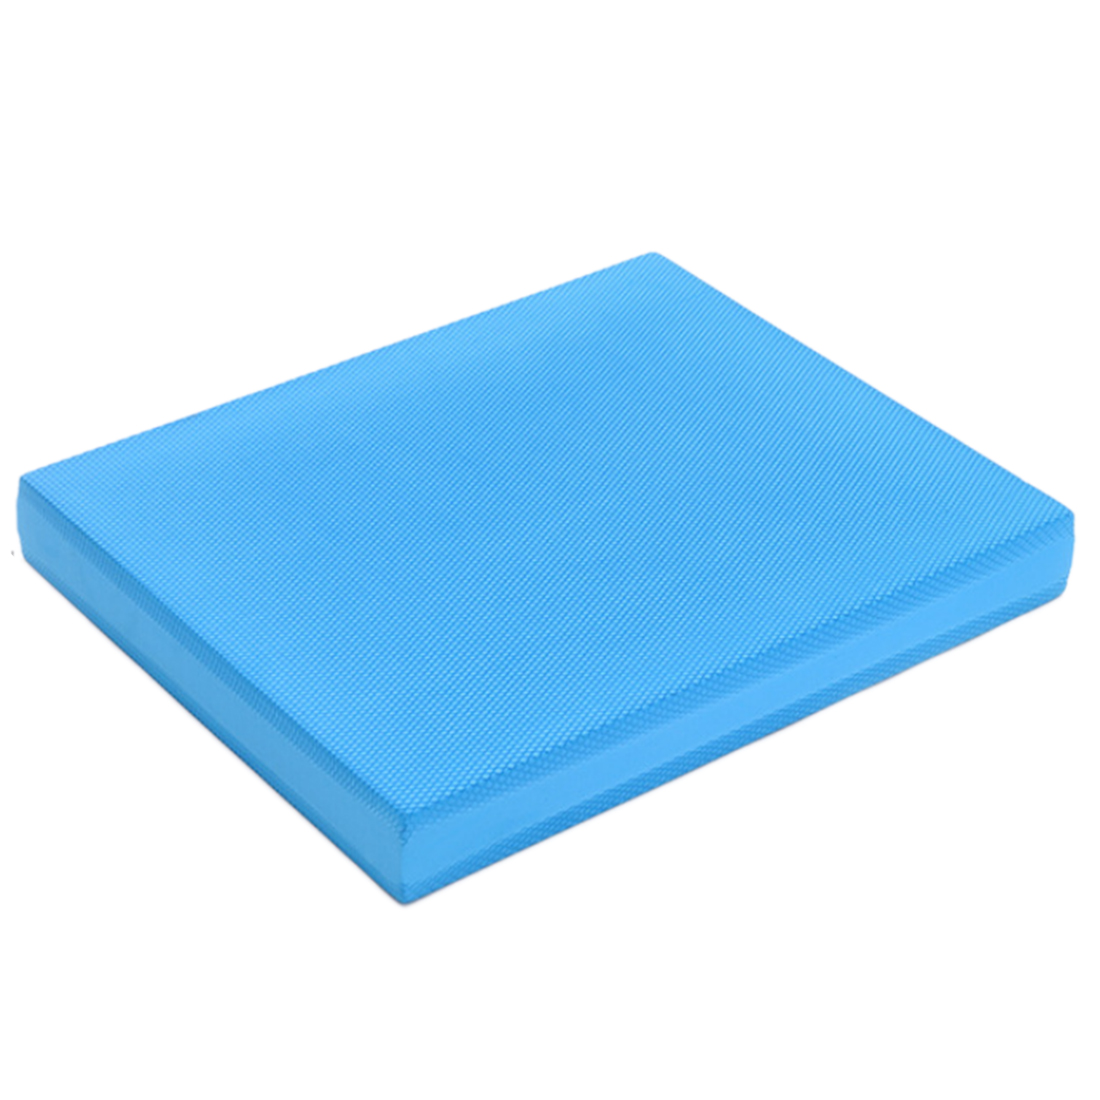 Yoga Balance Pad